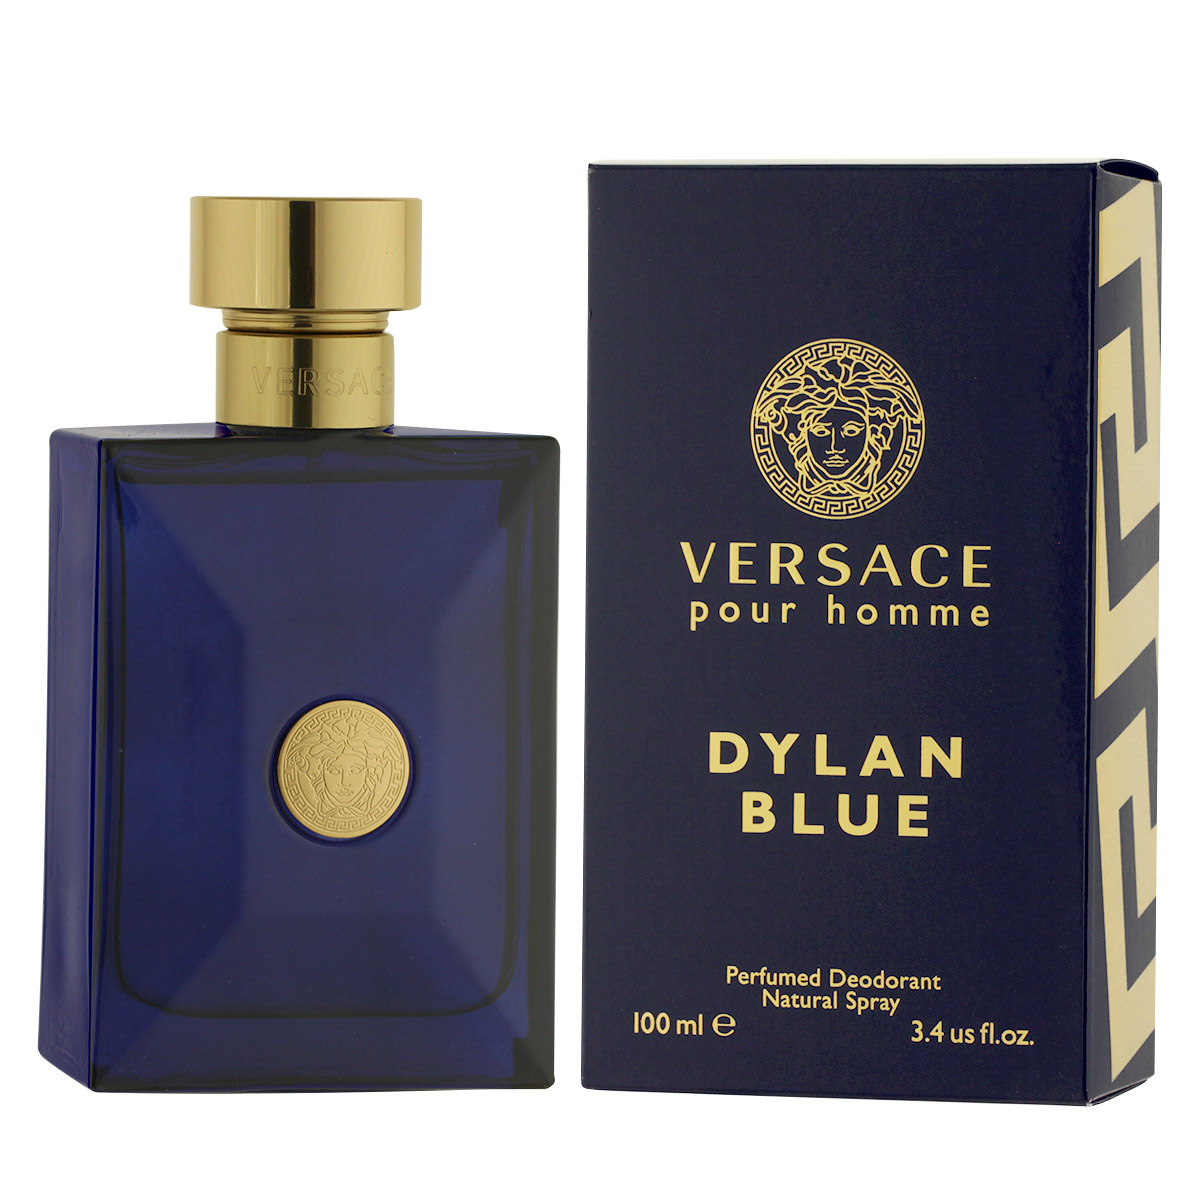 Versace Pour Homme Dylan Blue DEO ve skle 100 ml M